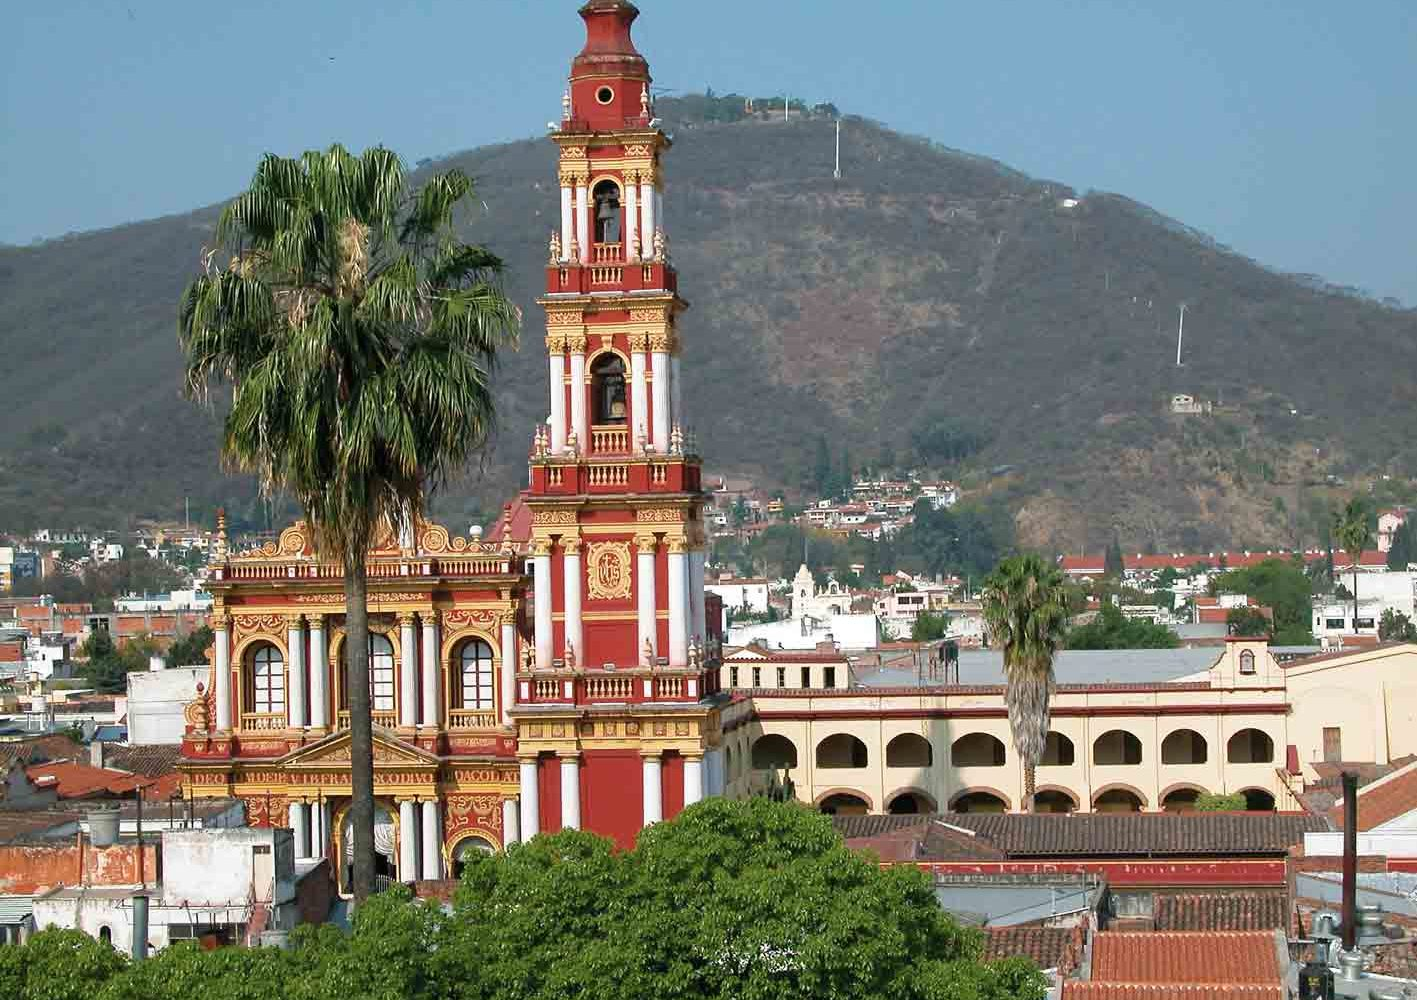 Kolonialstadt Salta